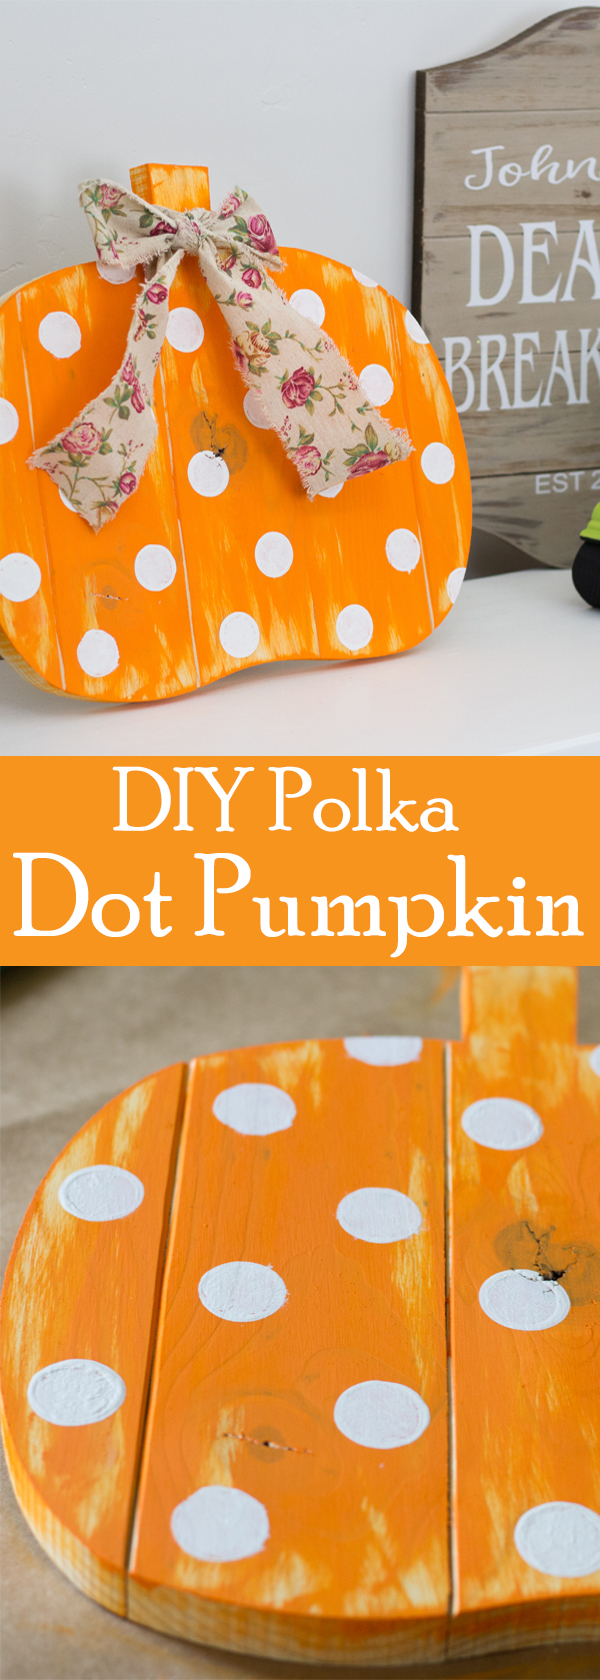 Fall DIY Polka Dot Pumpkin